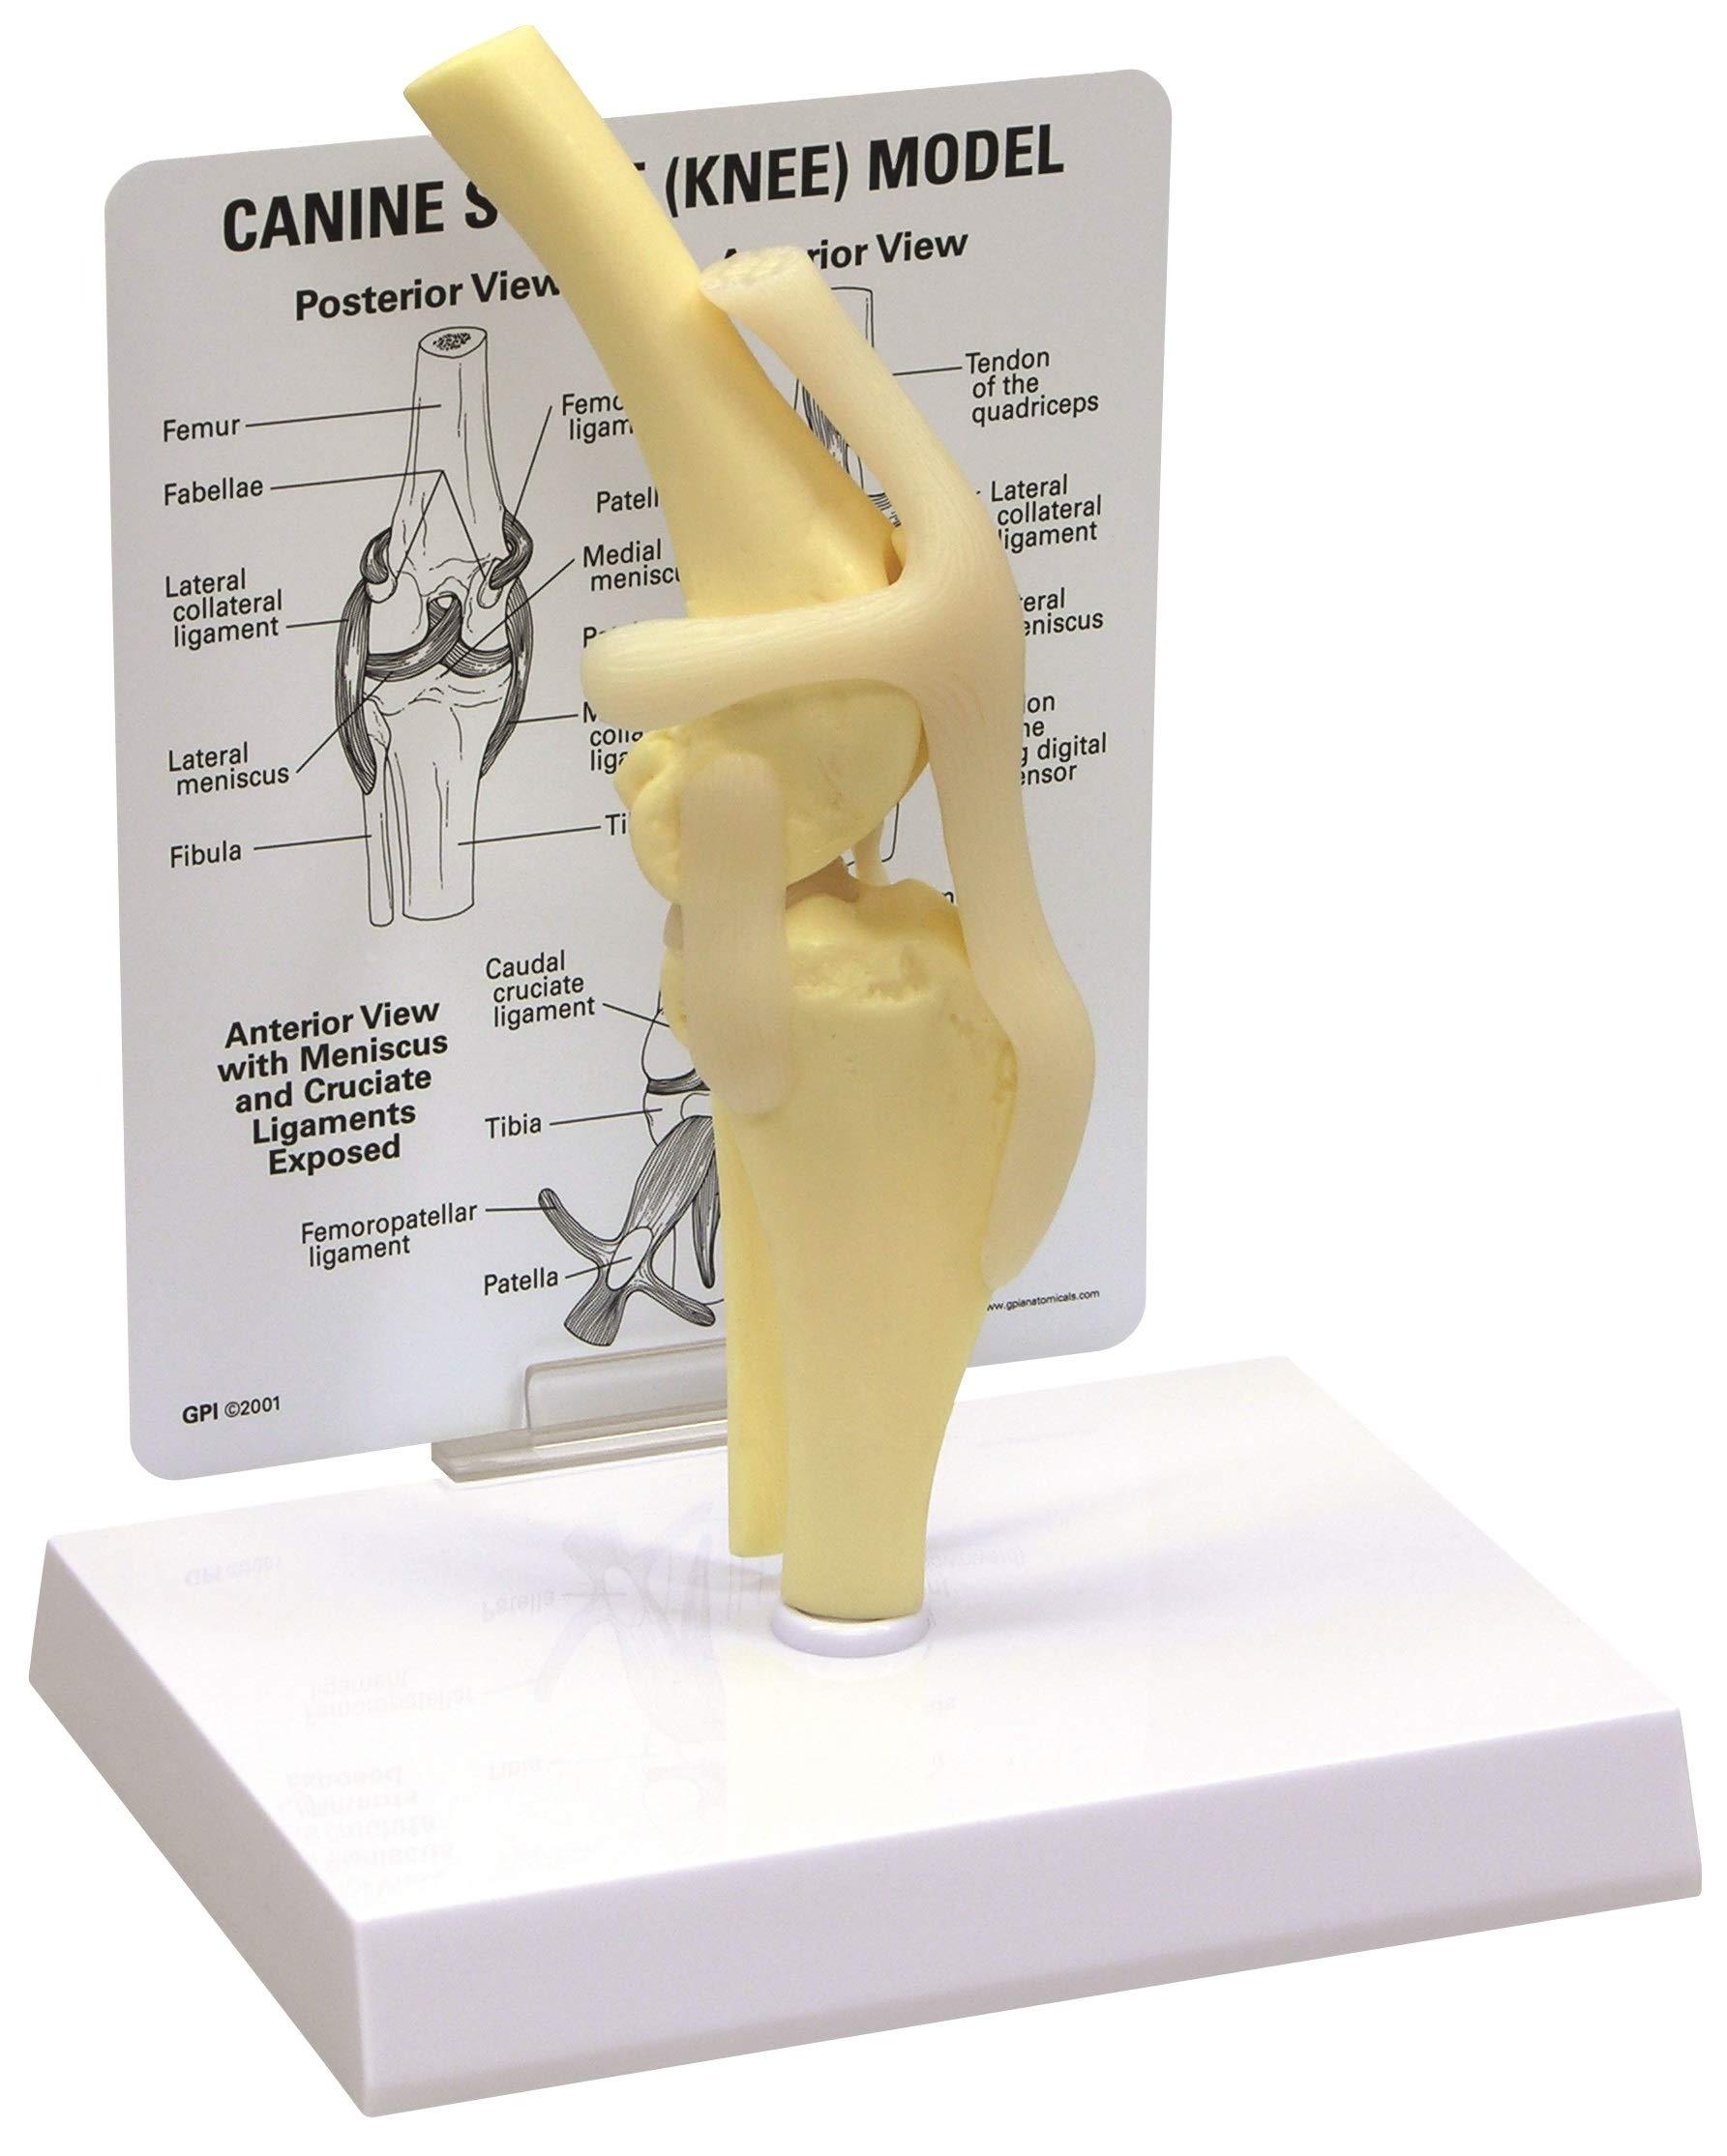 Canine/Dog Knee Joint Anatomy/Anatomical Model #9050